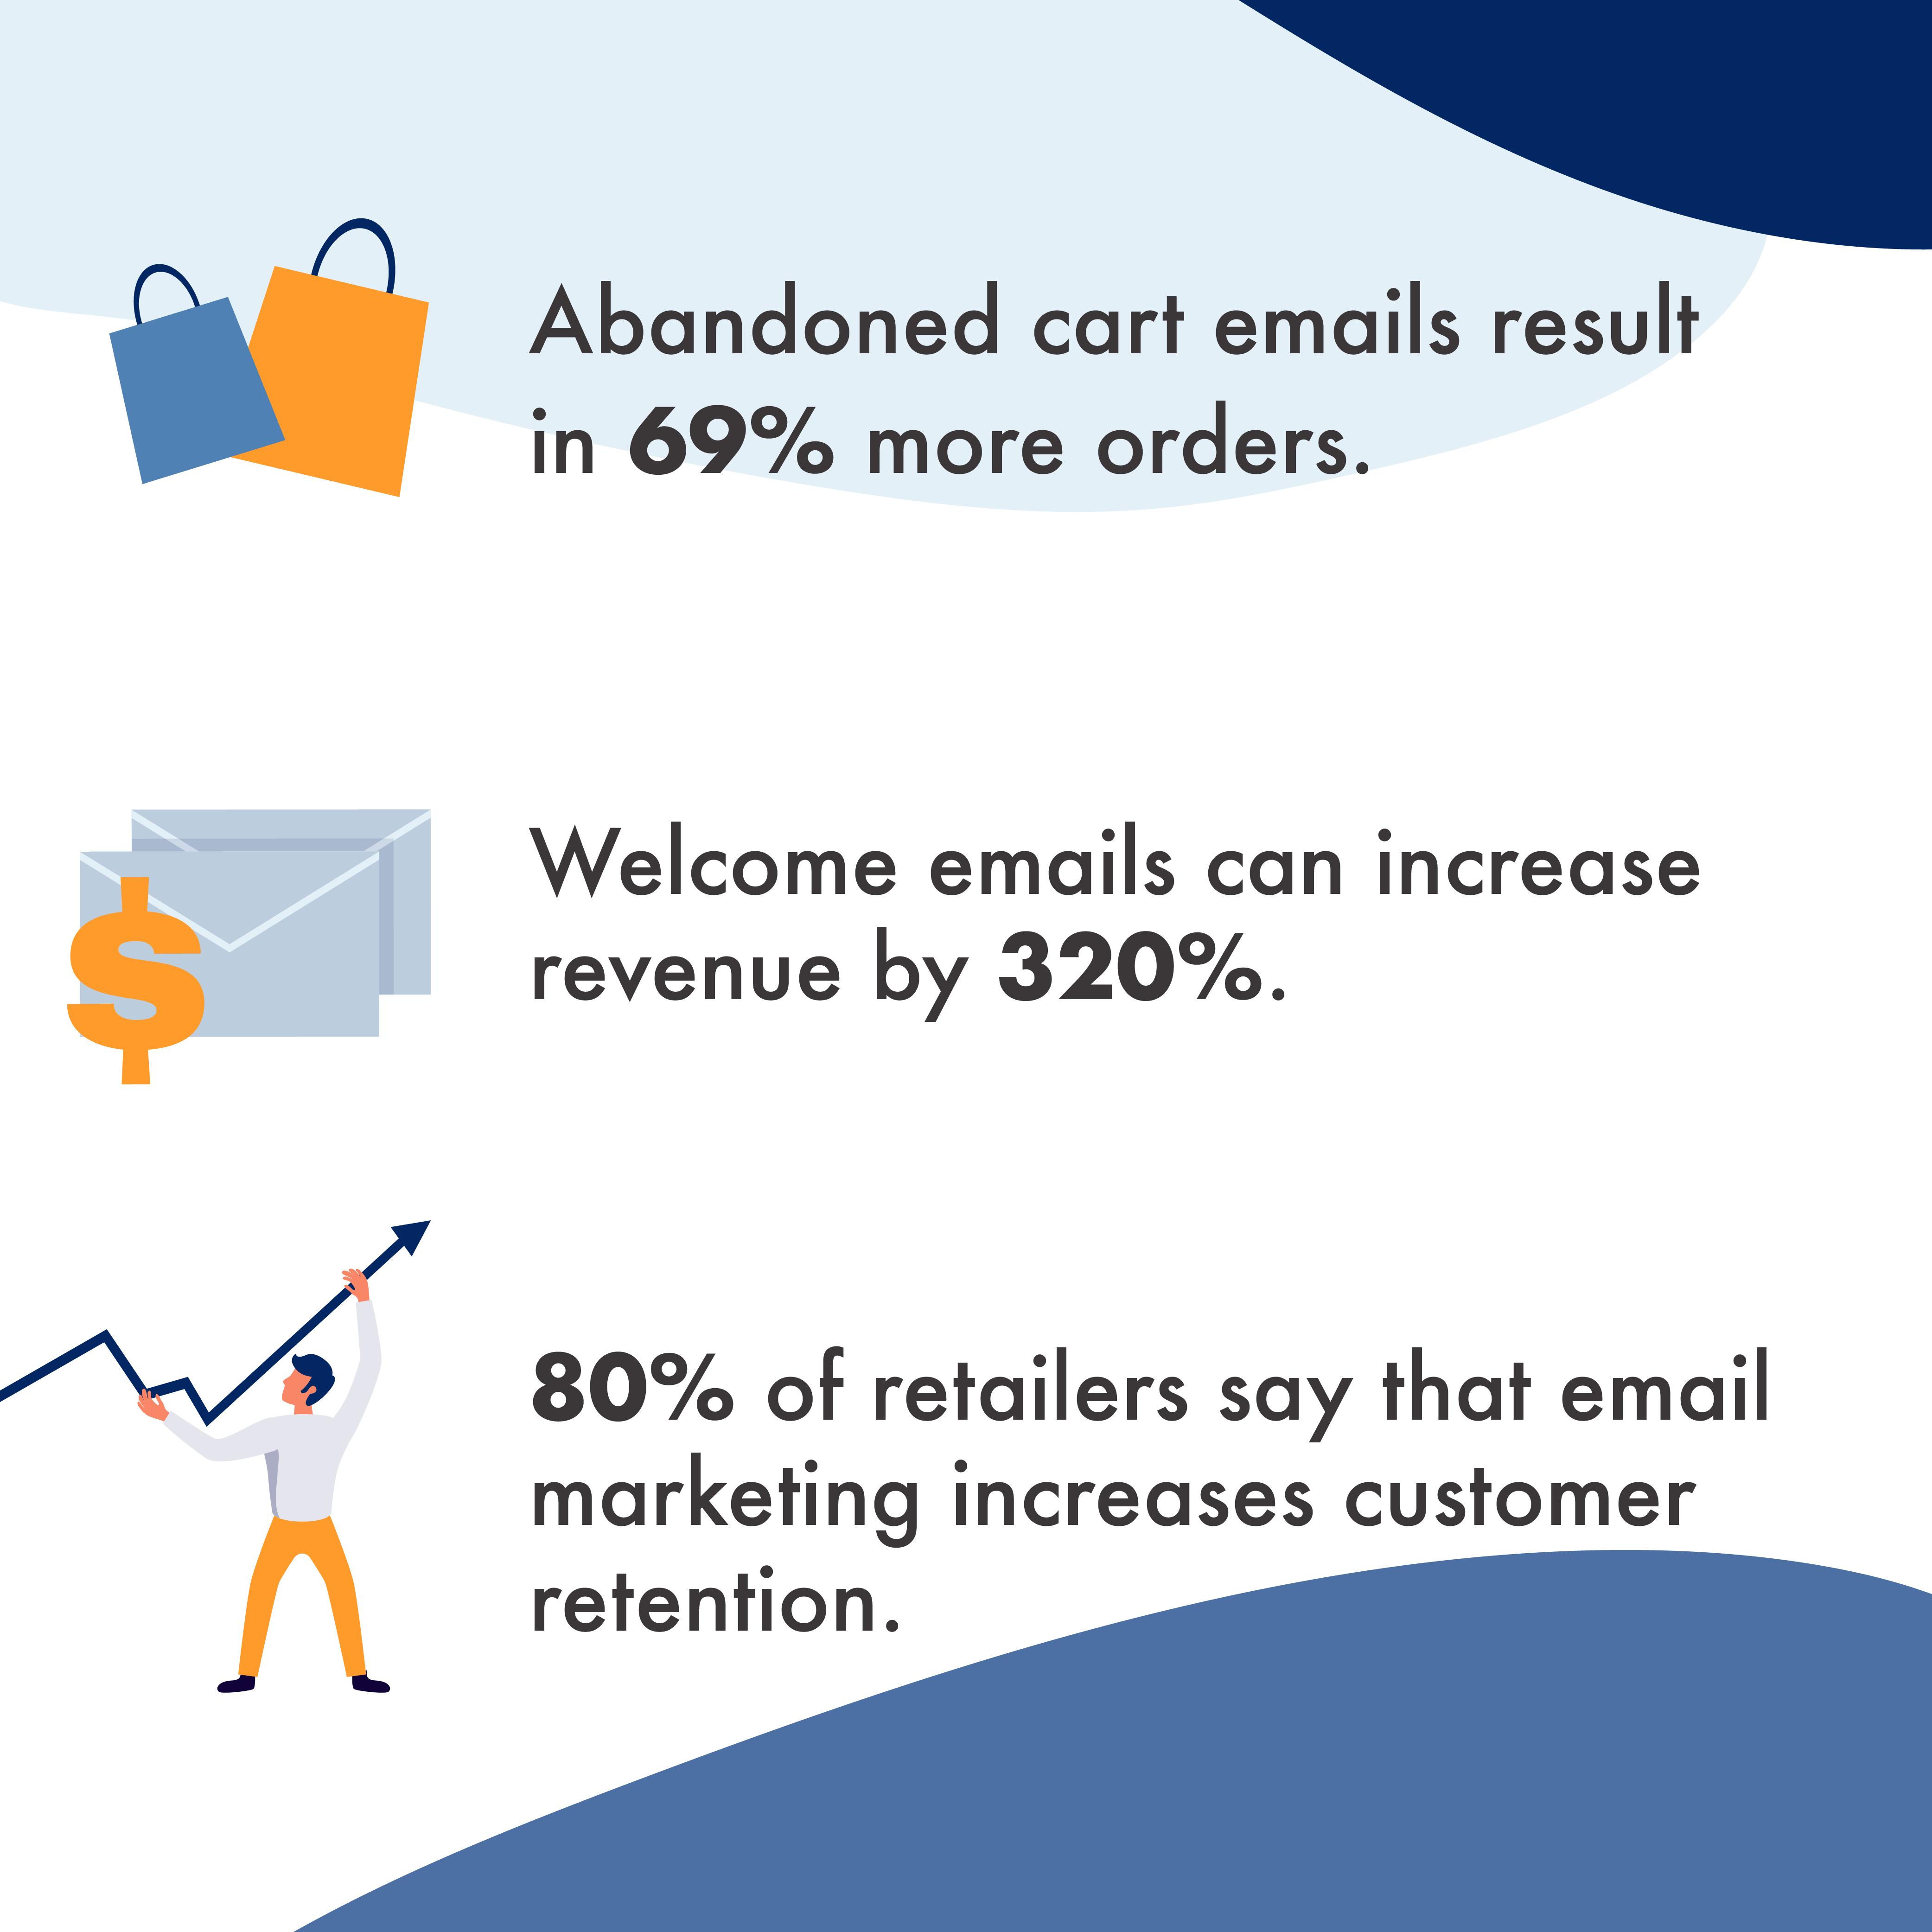 B2C Email Marketing Statistics